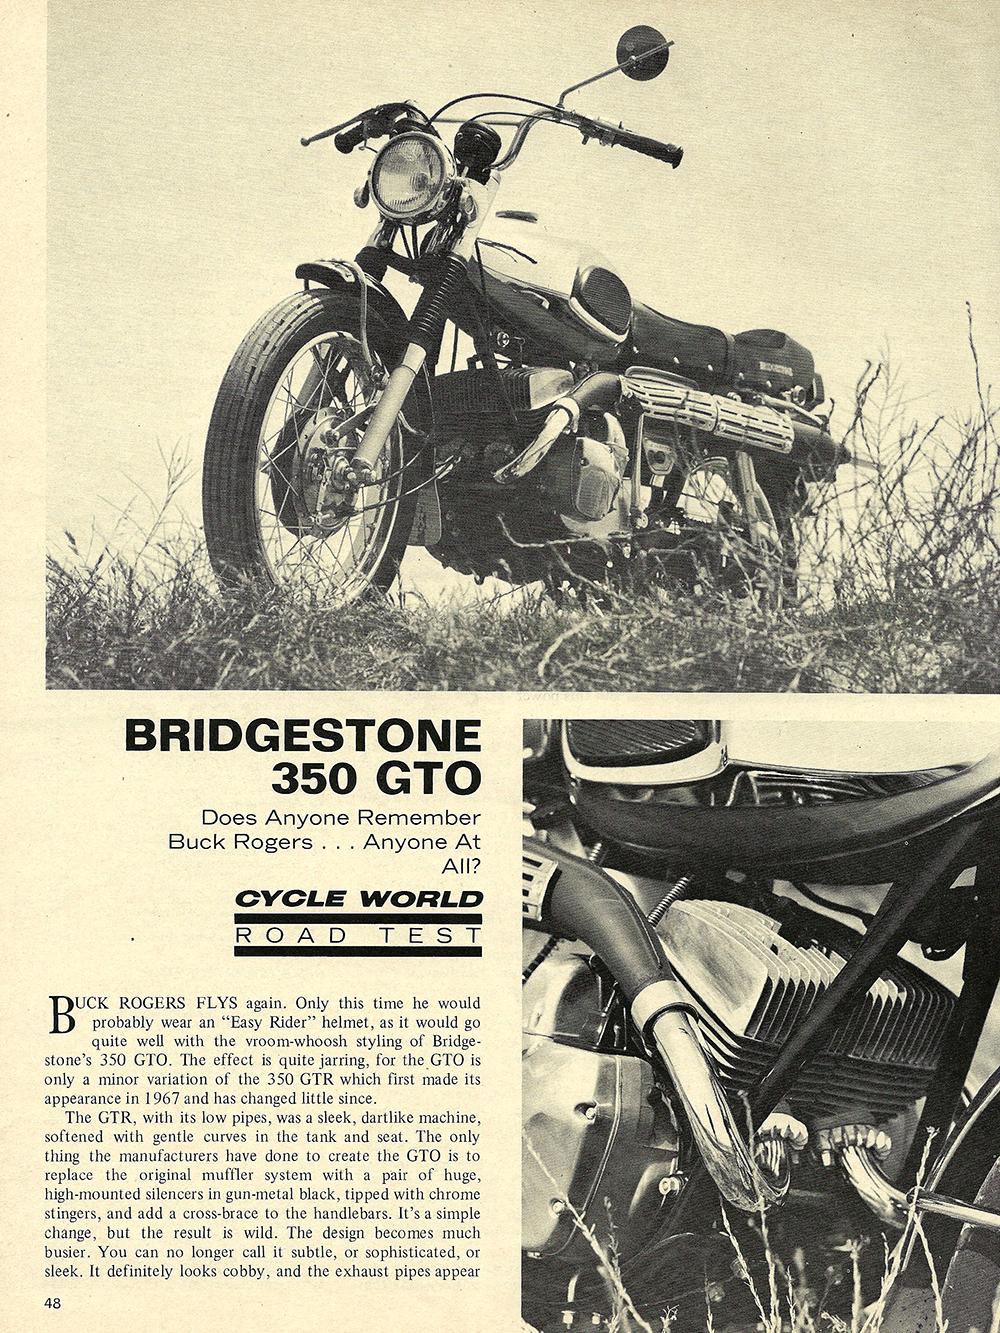 1970 Bridgestone 350 GTO scrambler road test 01.jpg